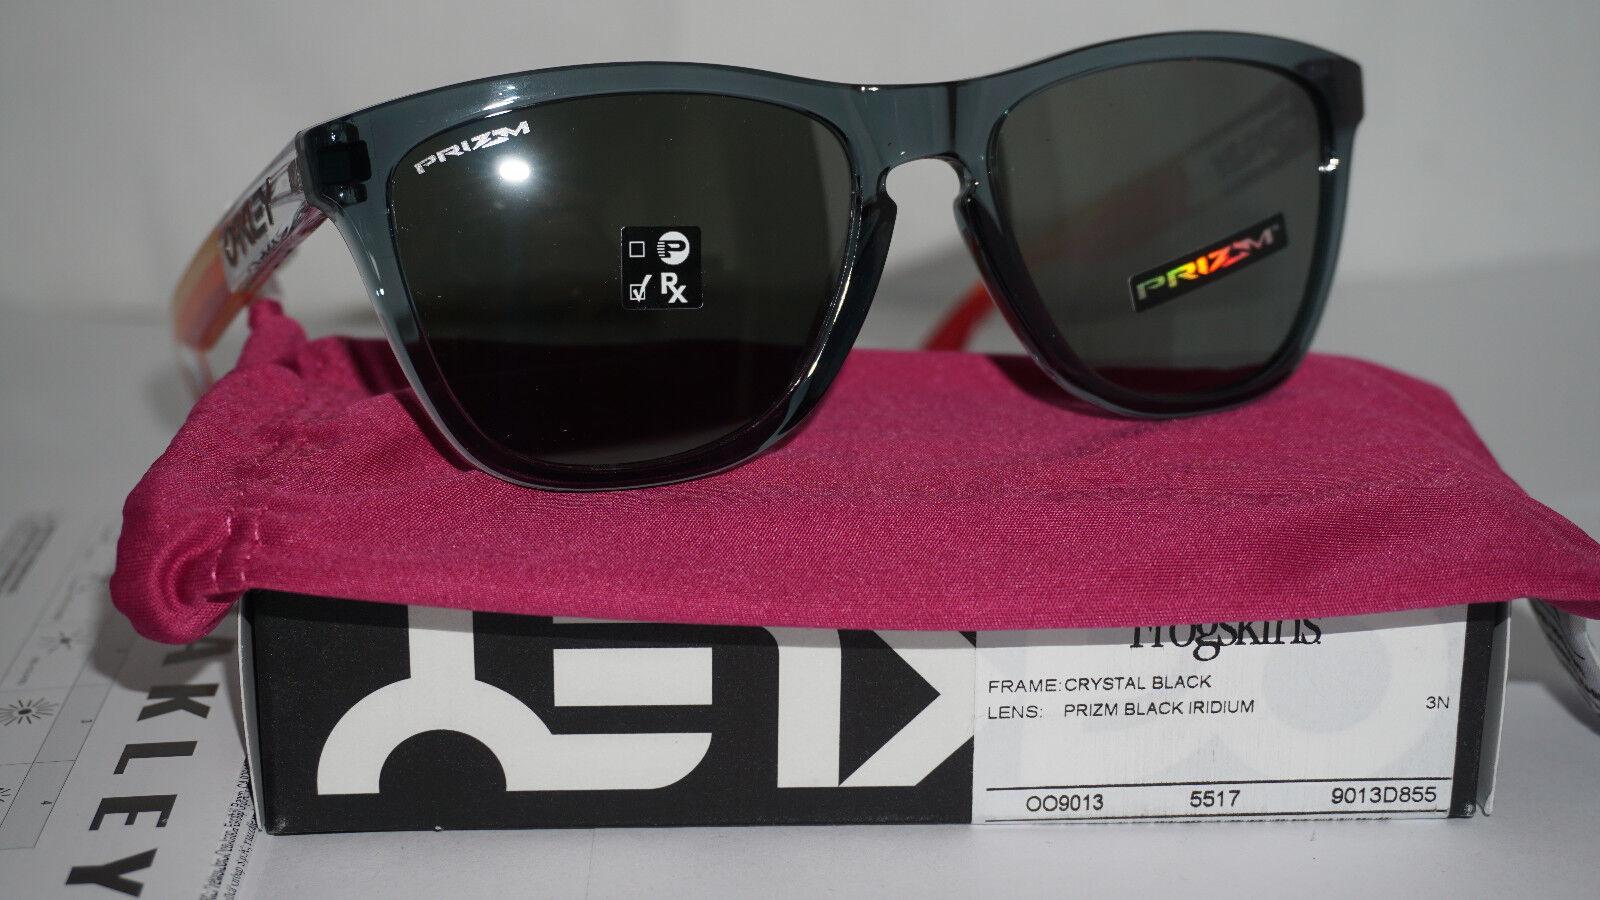 334151dc4c1f Oakley Frogskins Sunglasses Crystal Black prizm Black Iridium Oo9013 ...